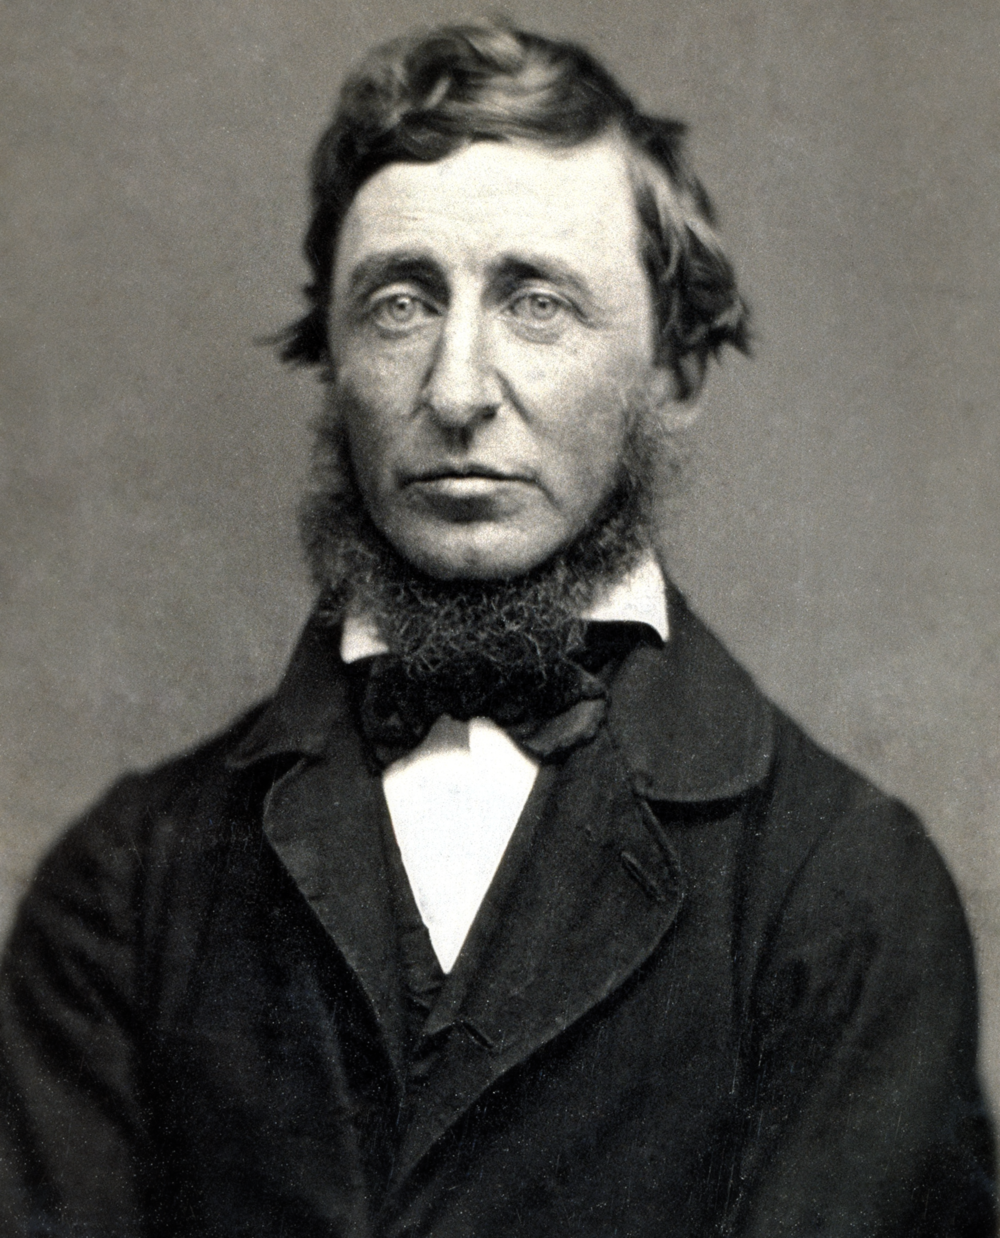 Daguerreotype of Thoreau by Benjamin D. Maxham. Public domain from  Wikimedia Commons .